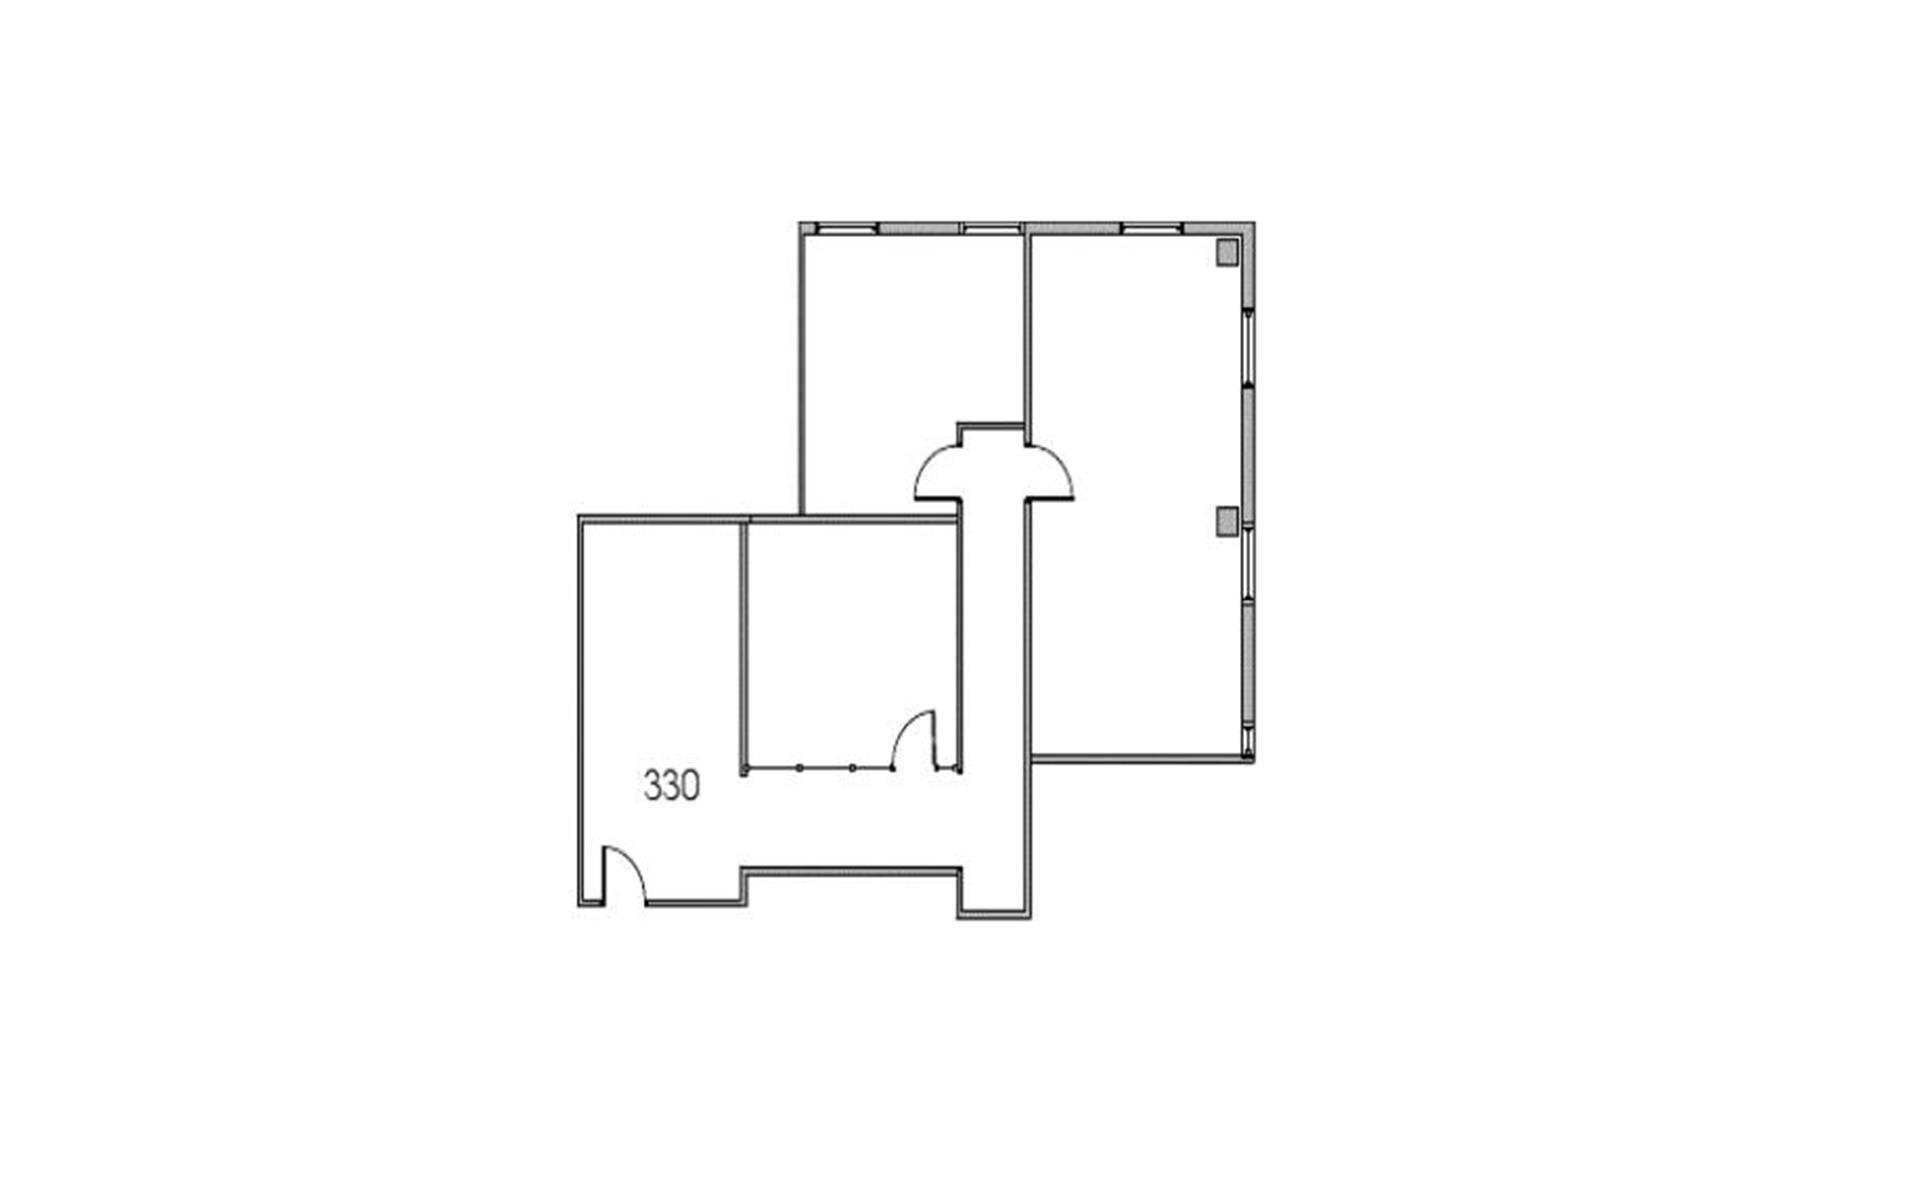 Boxer - 2323 South Voss - Team Office   Suite 330